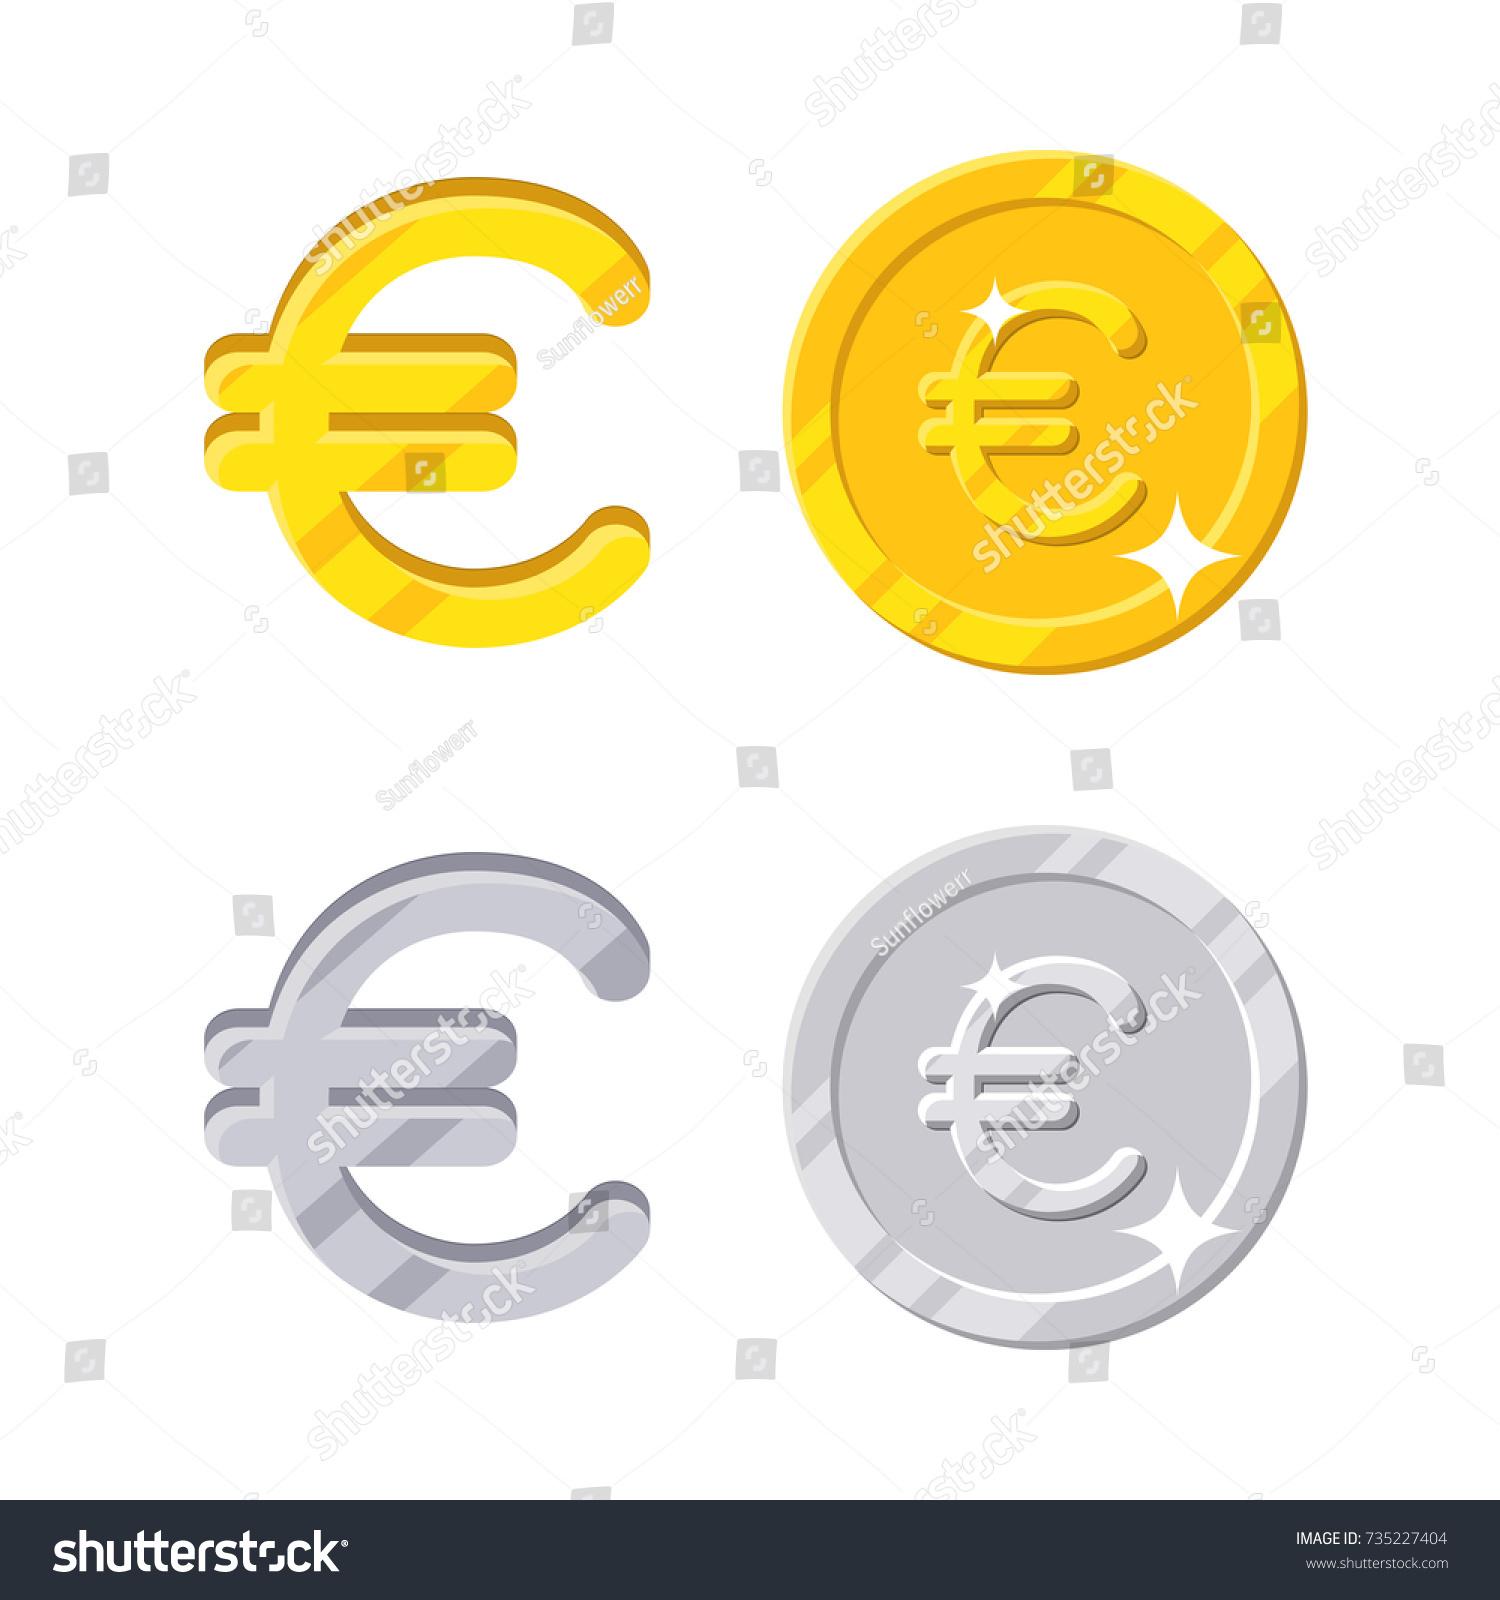 Euro sign gold silver symbol europa stock vector 735227404 gold and silver symbol of the europa currency and coins vector in buycottarizona